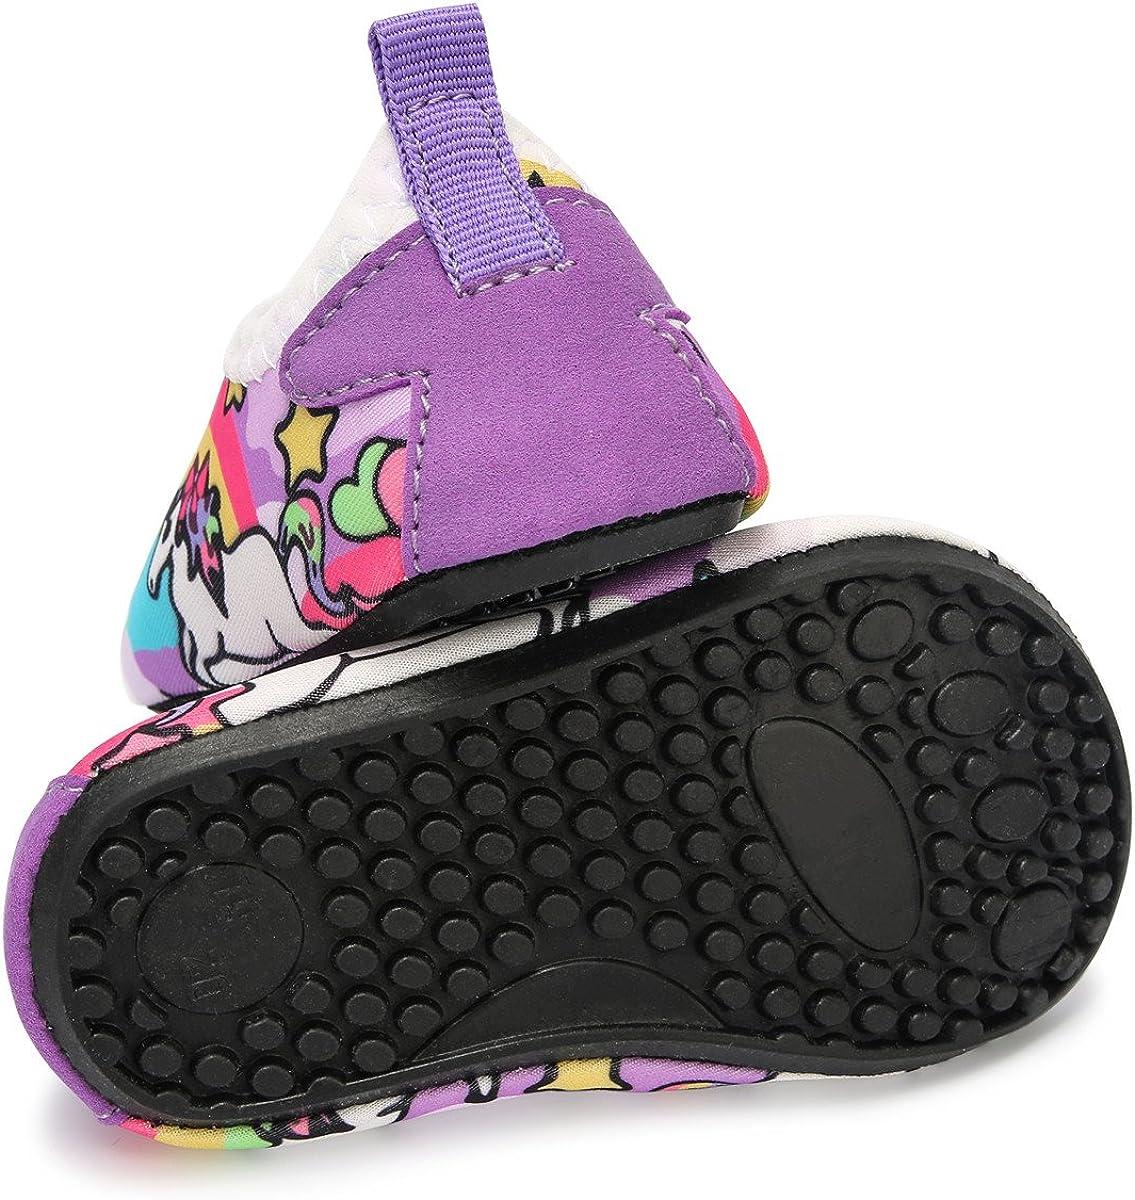 JIASUQI Baby Barefoot Swim Water Skin Shoes Calcetines Aqua para Piscina de nataci/ón en la Playa